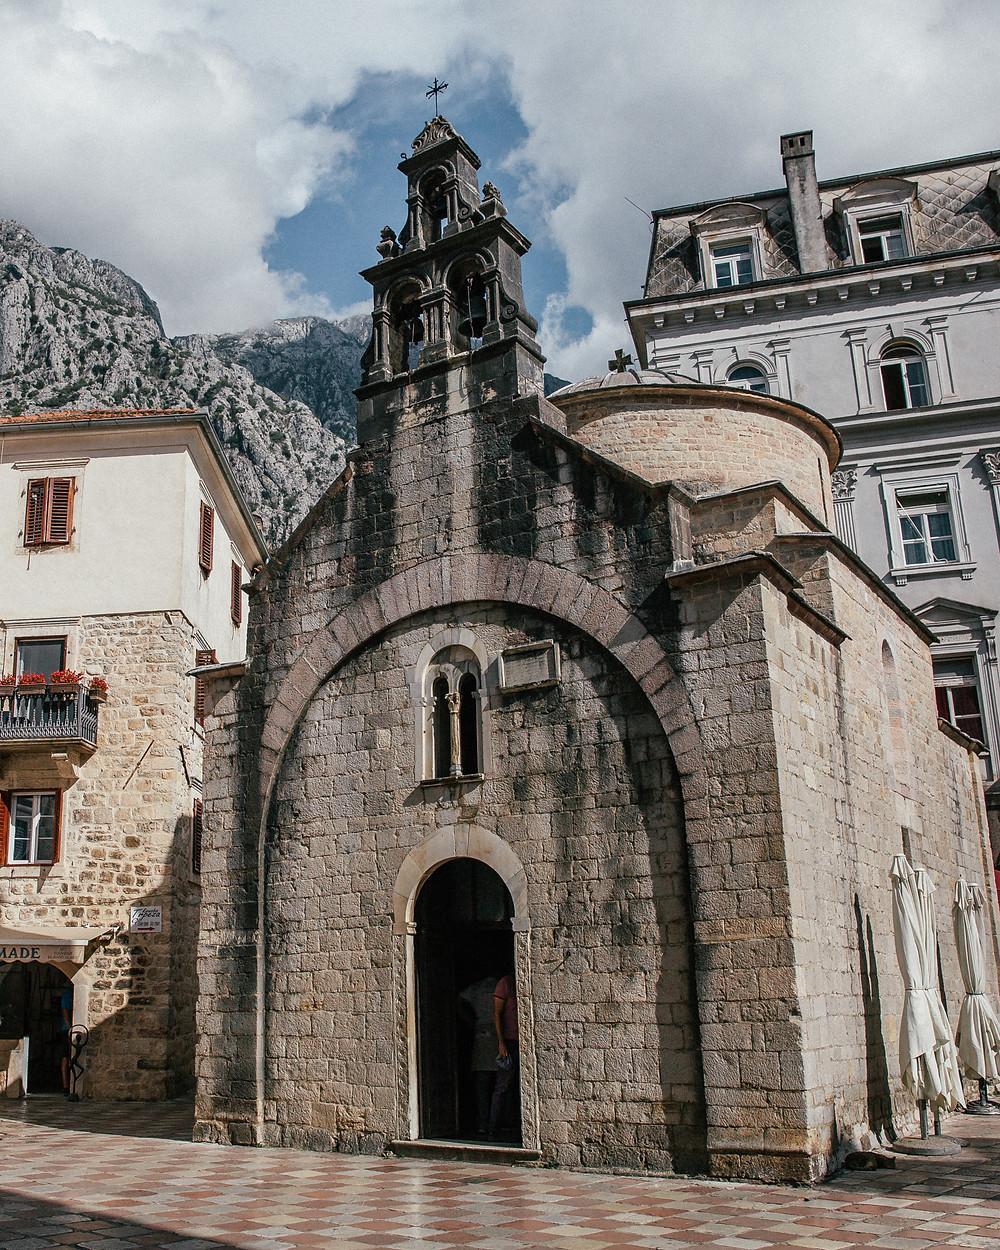 St. Luke's Church, Old Town Kotor, Montenegro